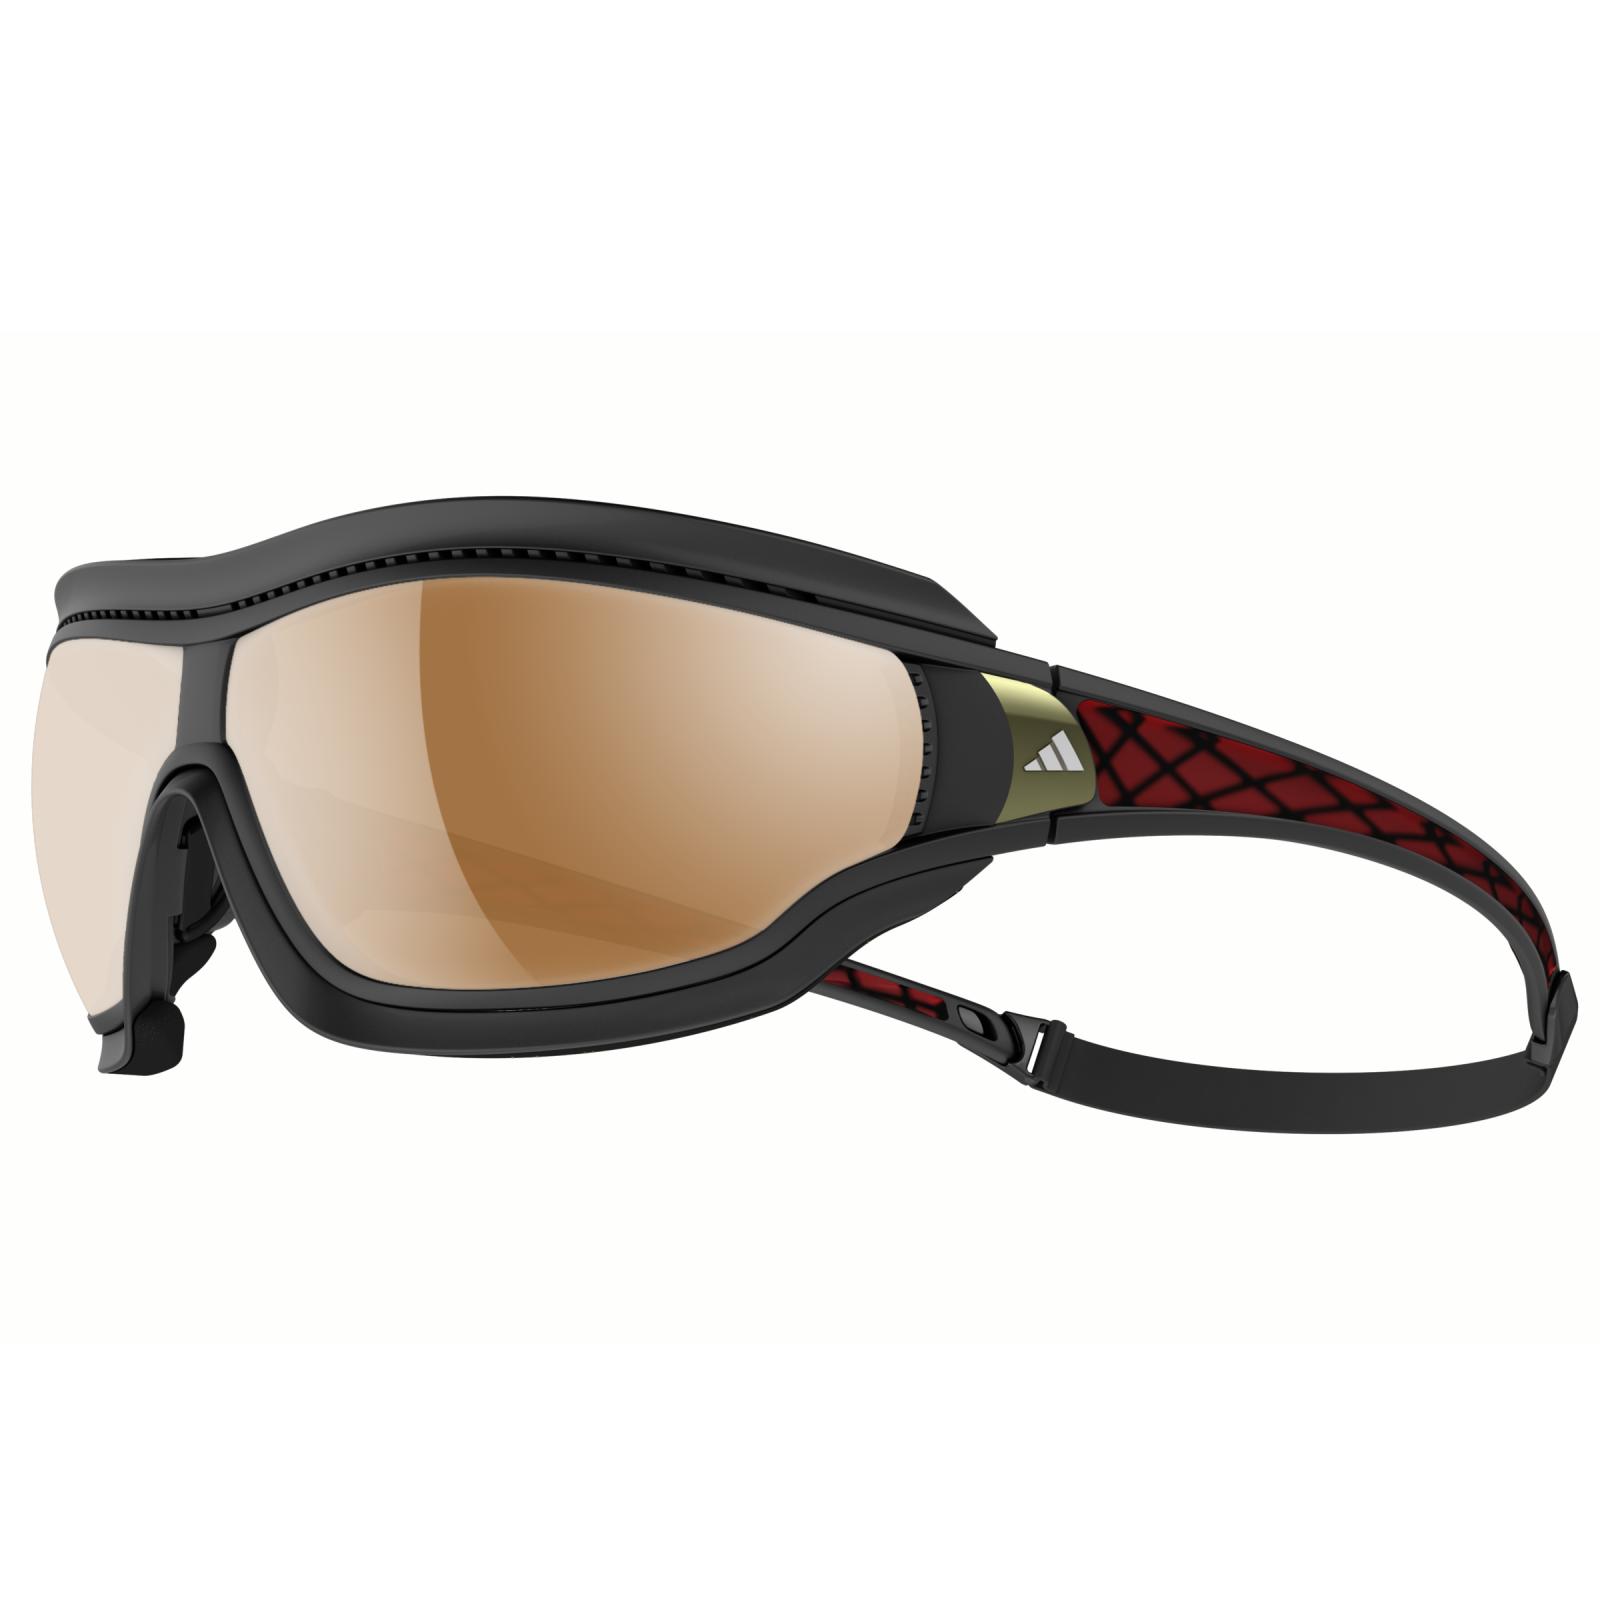 SUDADERA INTEGRAL para gafa de sol Adidas TYCANE S-0